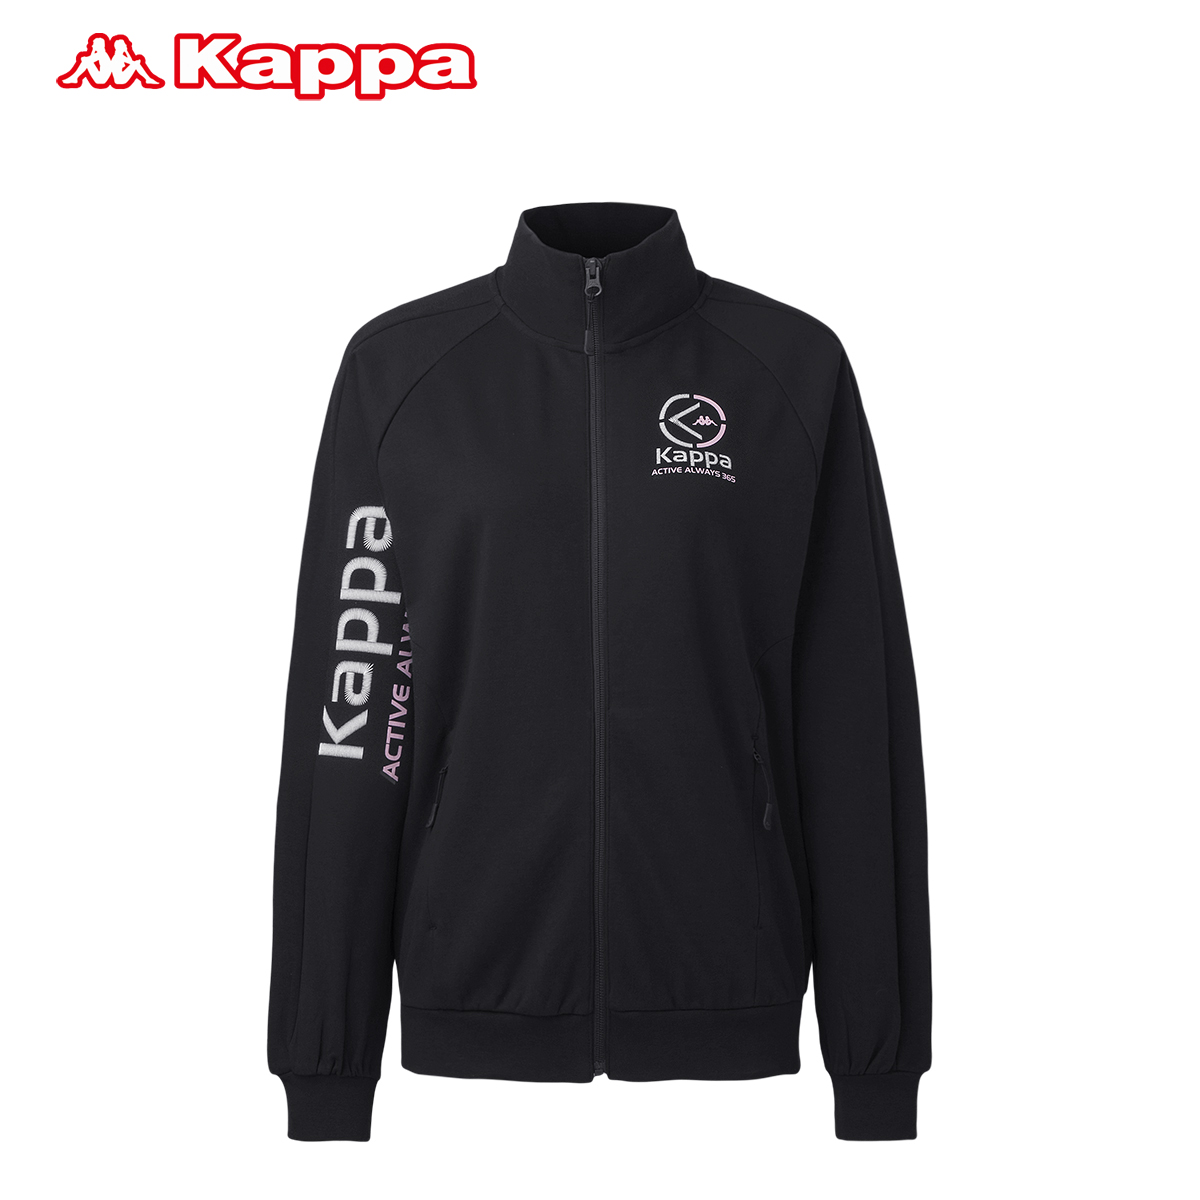 Kappa卡帕女款运动卫衣 针织开衫外套运动上衣2018新款|K0822WK39